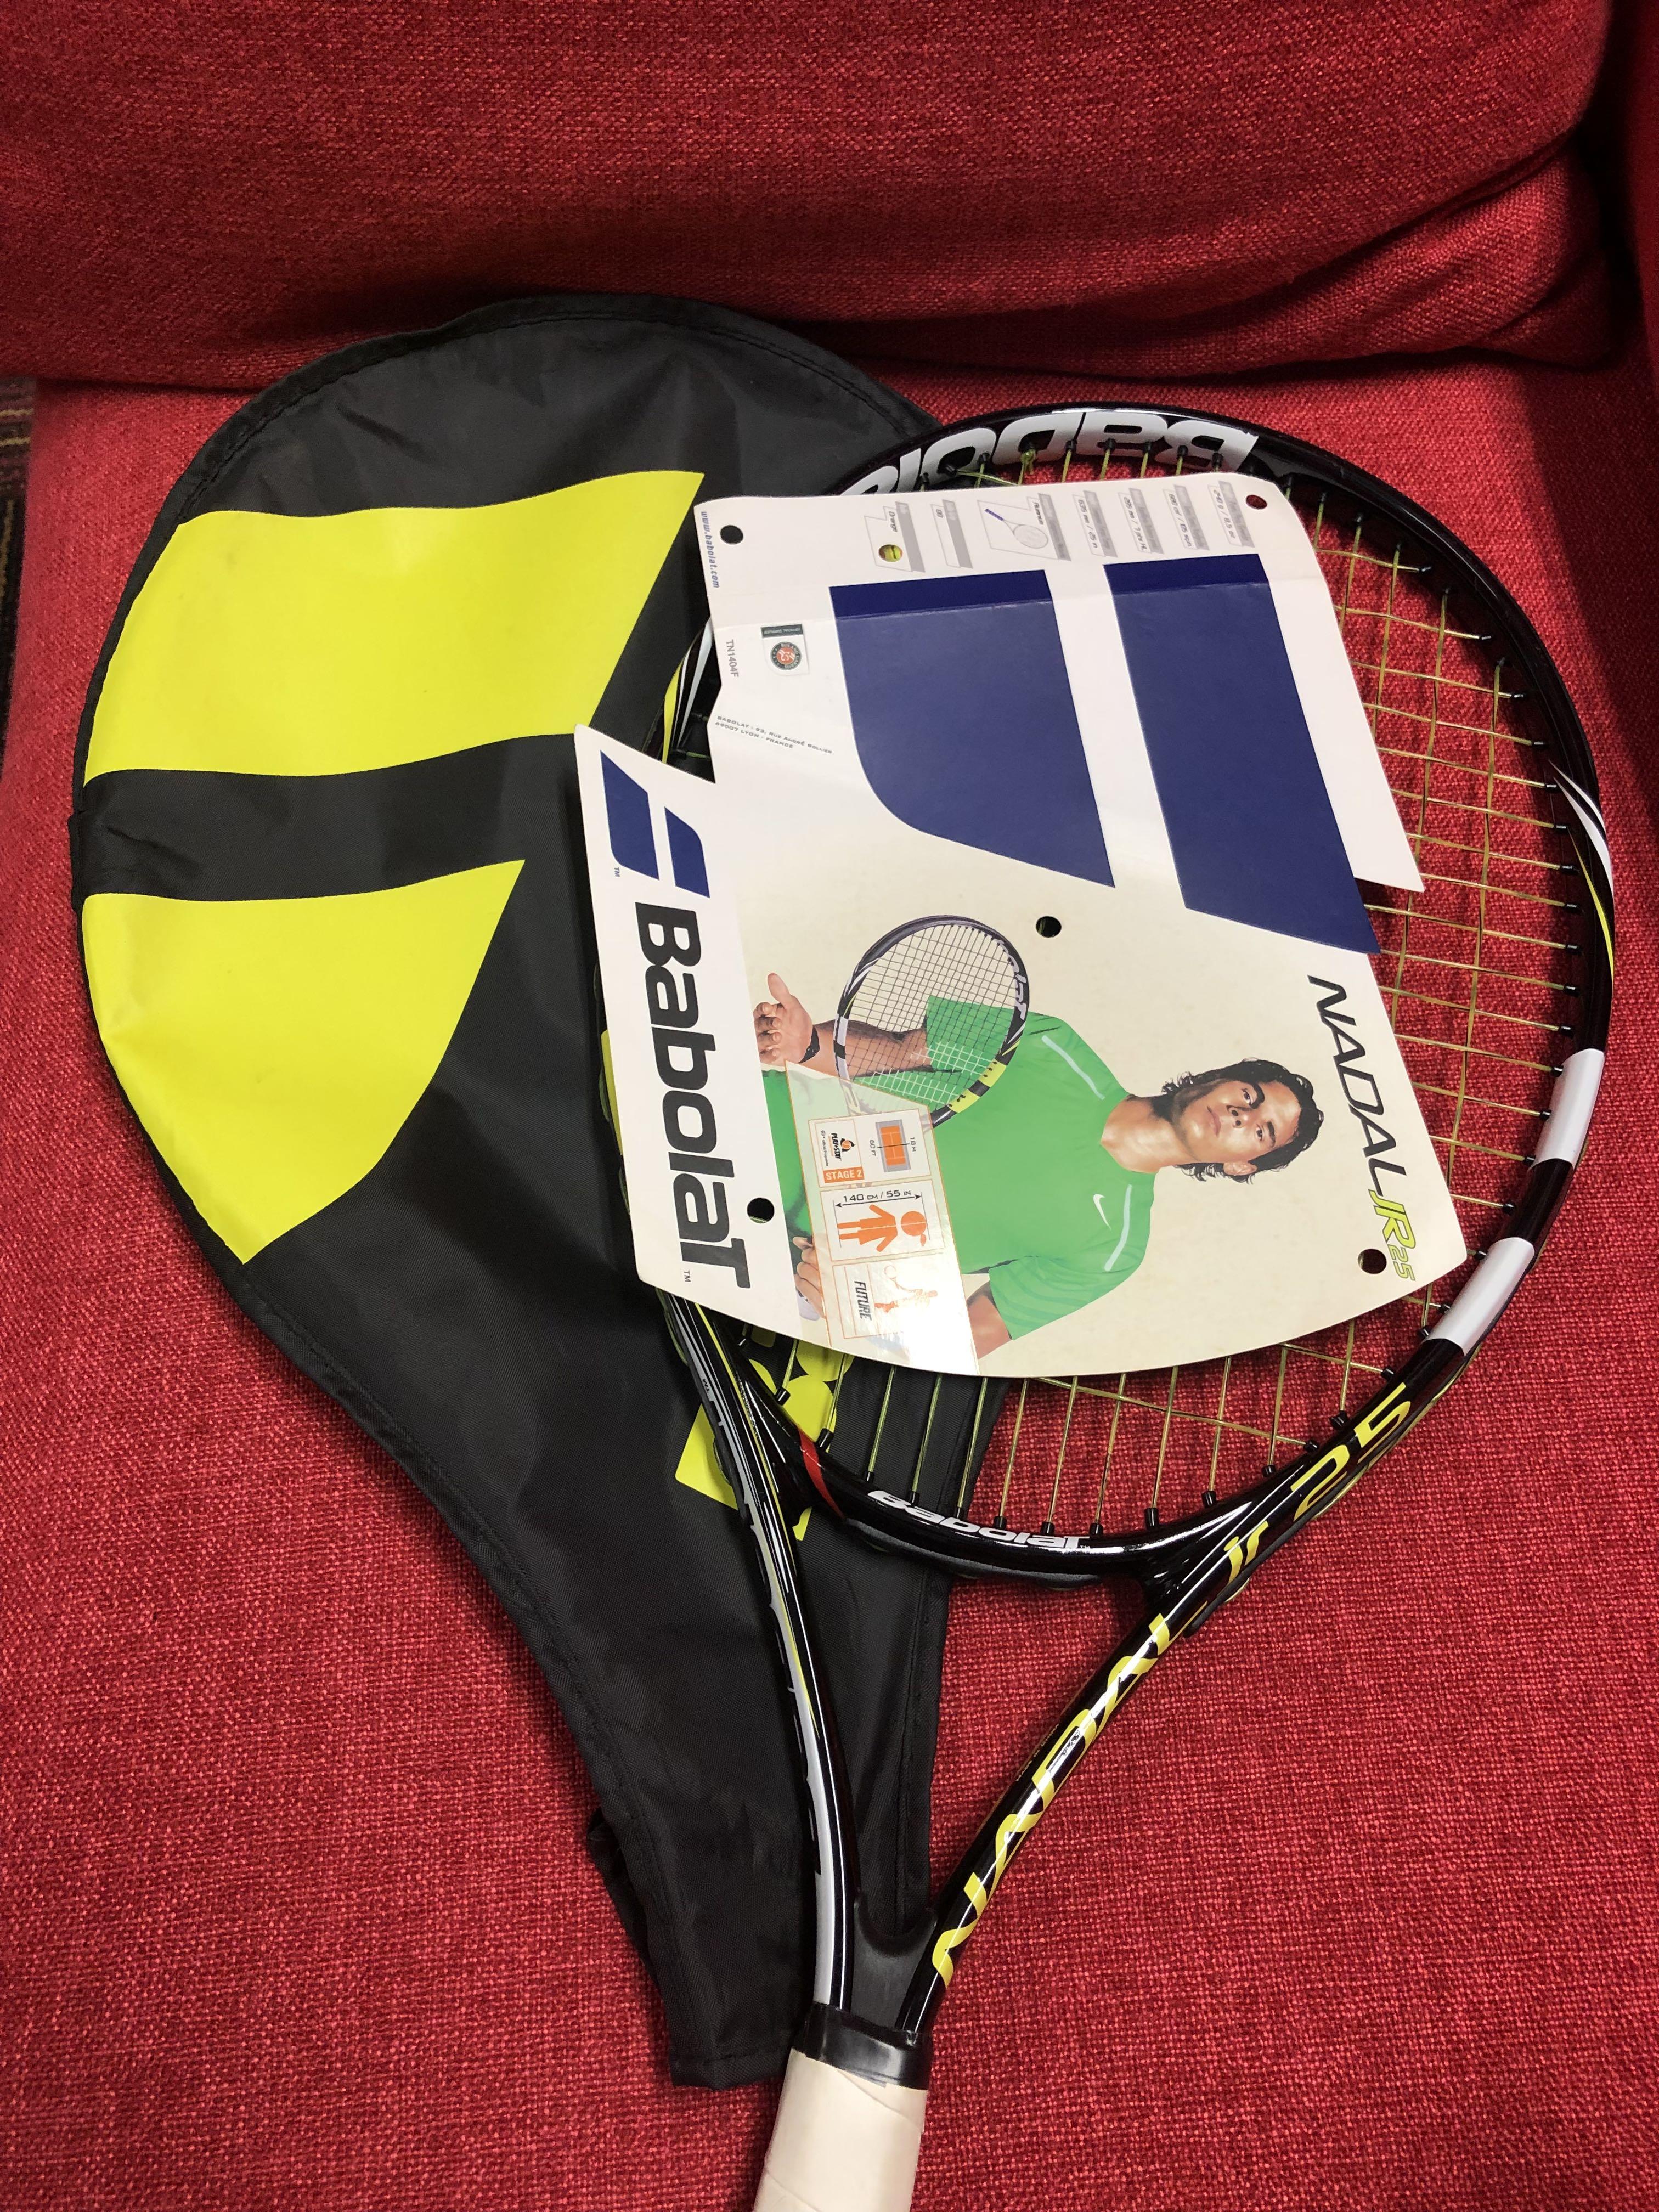 620186ebb9d3c BABOLAT Nadal 25 Junior Tennis Racquet, Sports, Sports & Games Equipment on  Carousell